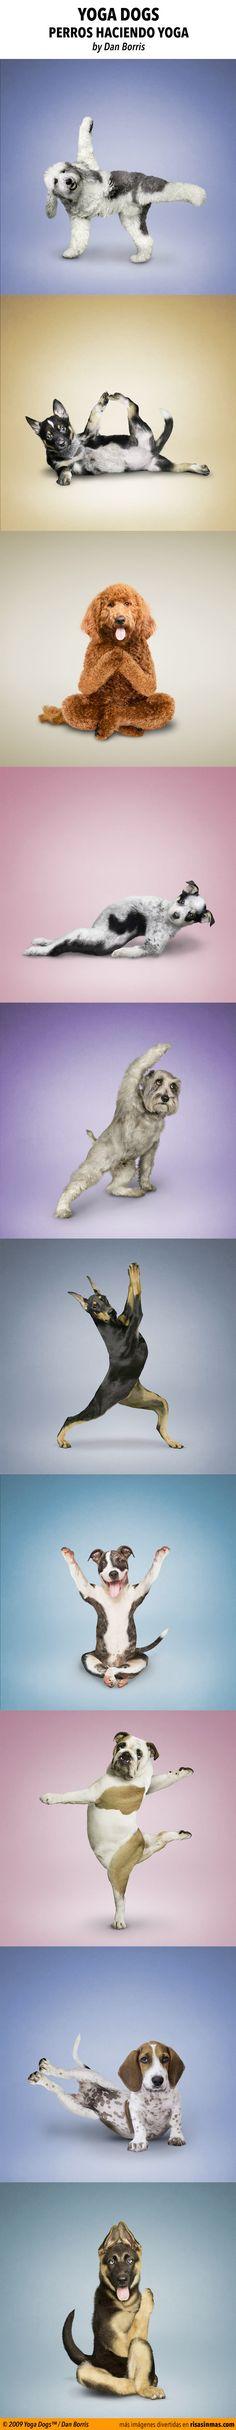 Yoga dogs, perros haciendo yoga.  © 2009 Yoga Dogs™ / Dan Borris